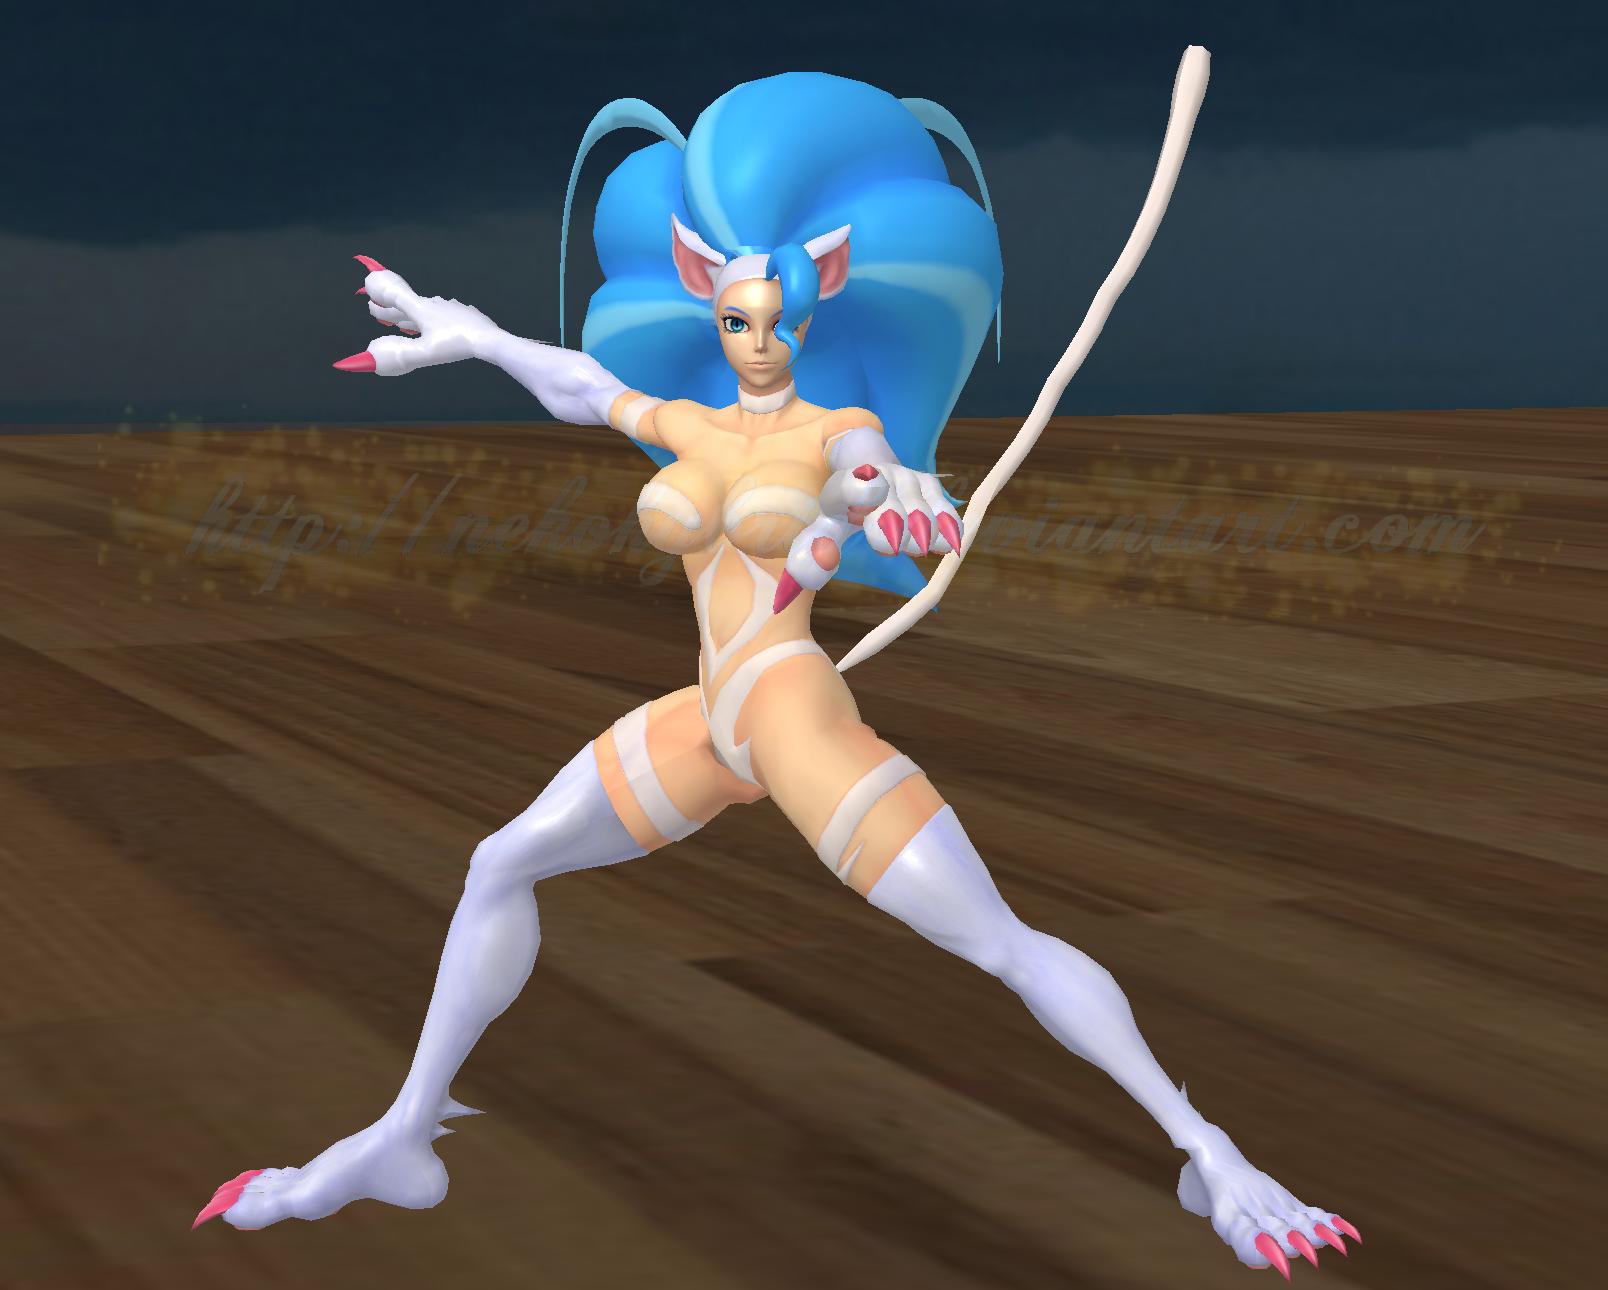 Felicia Kamen Rider Pose by NekoHybrid